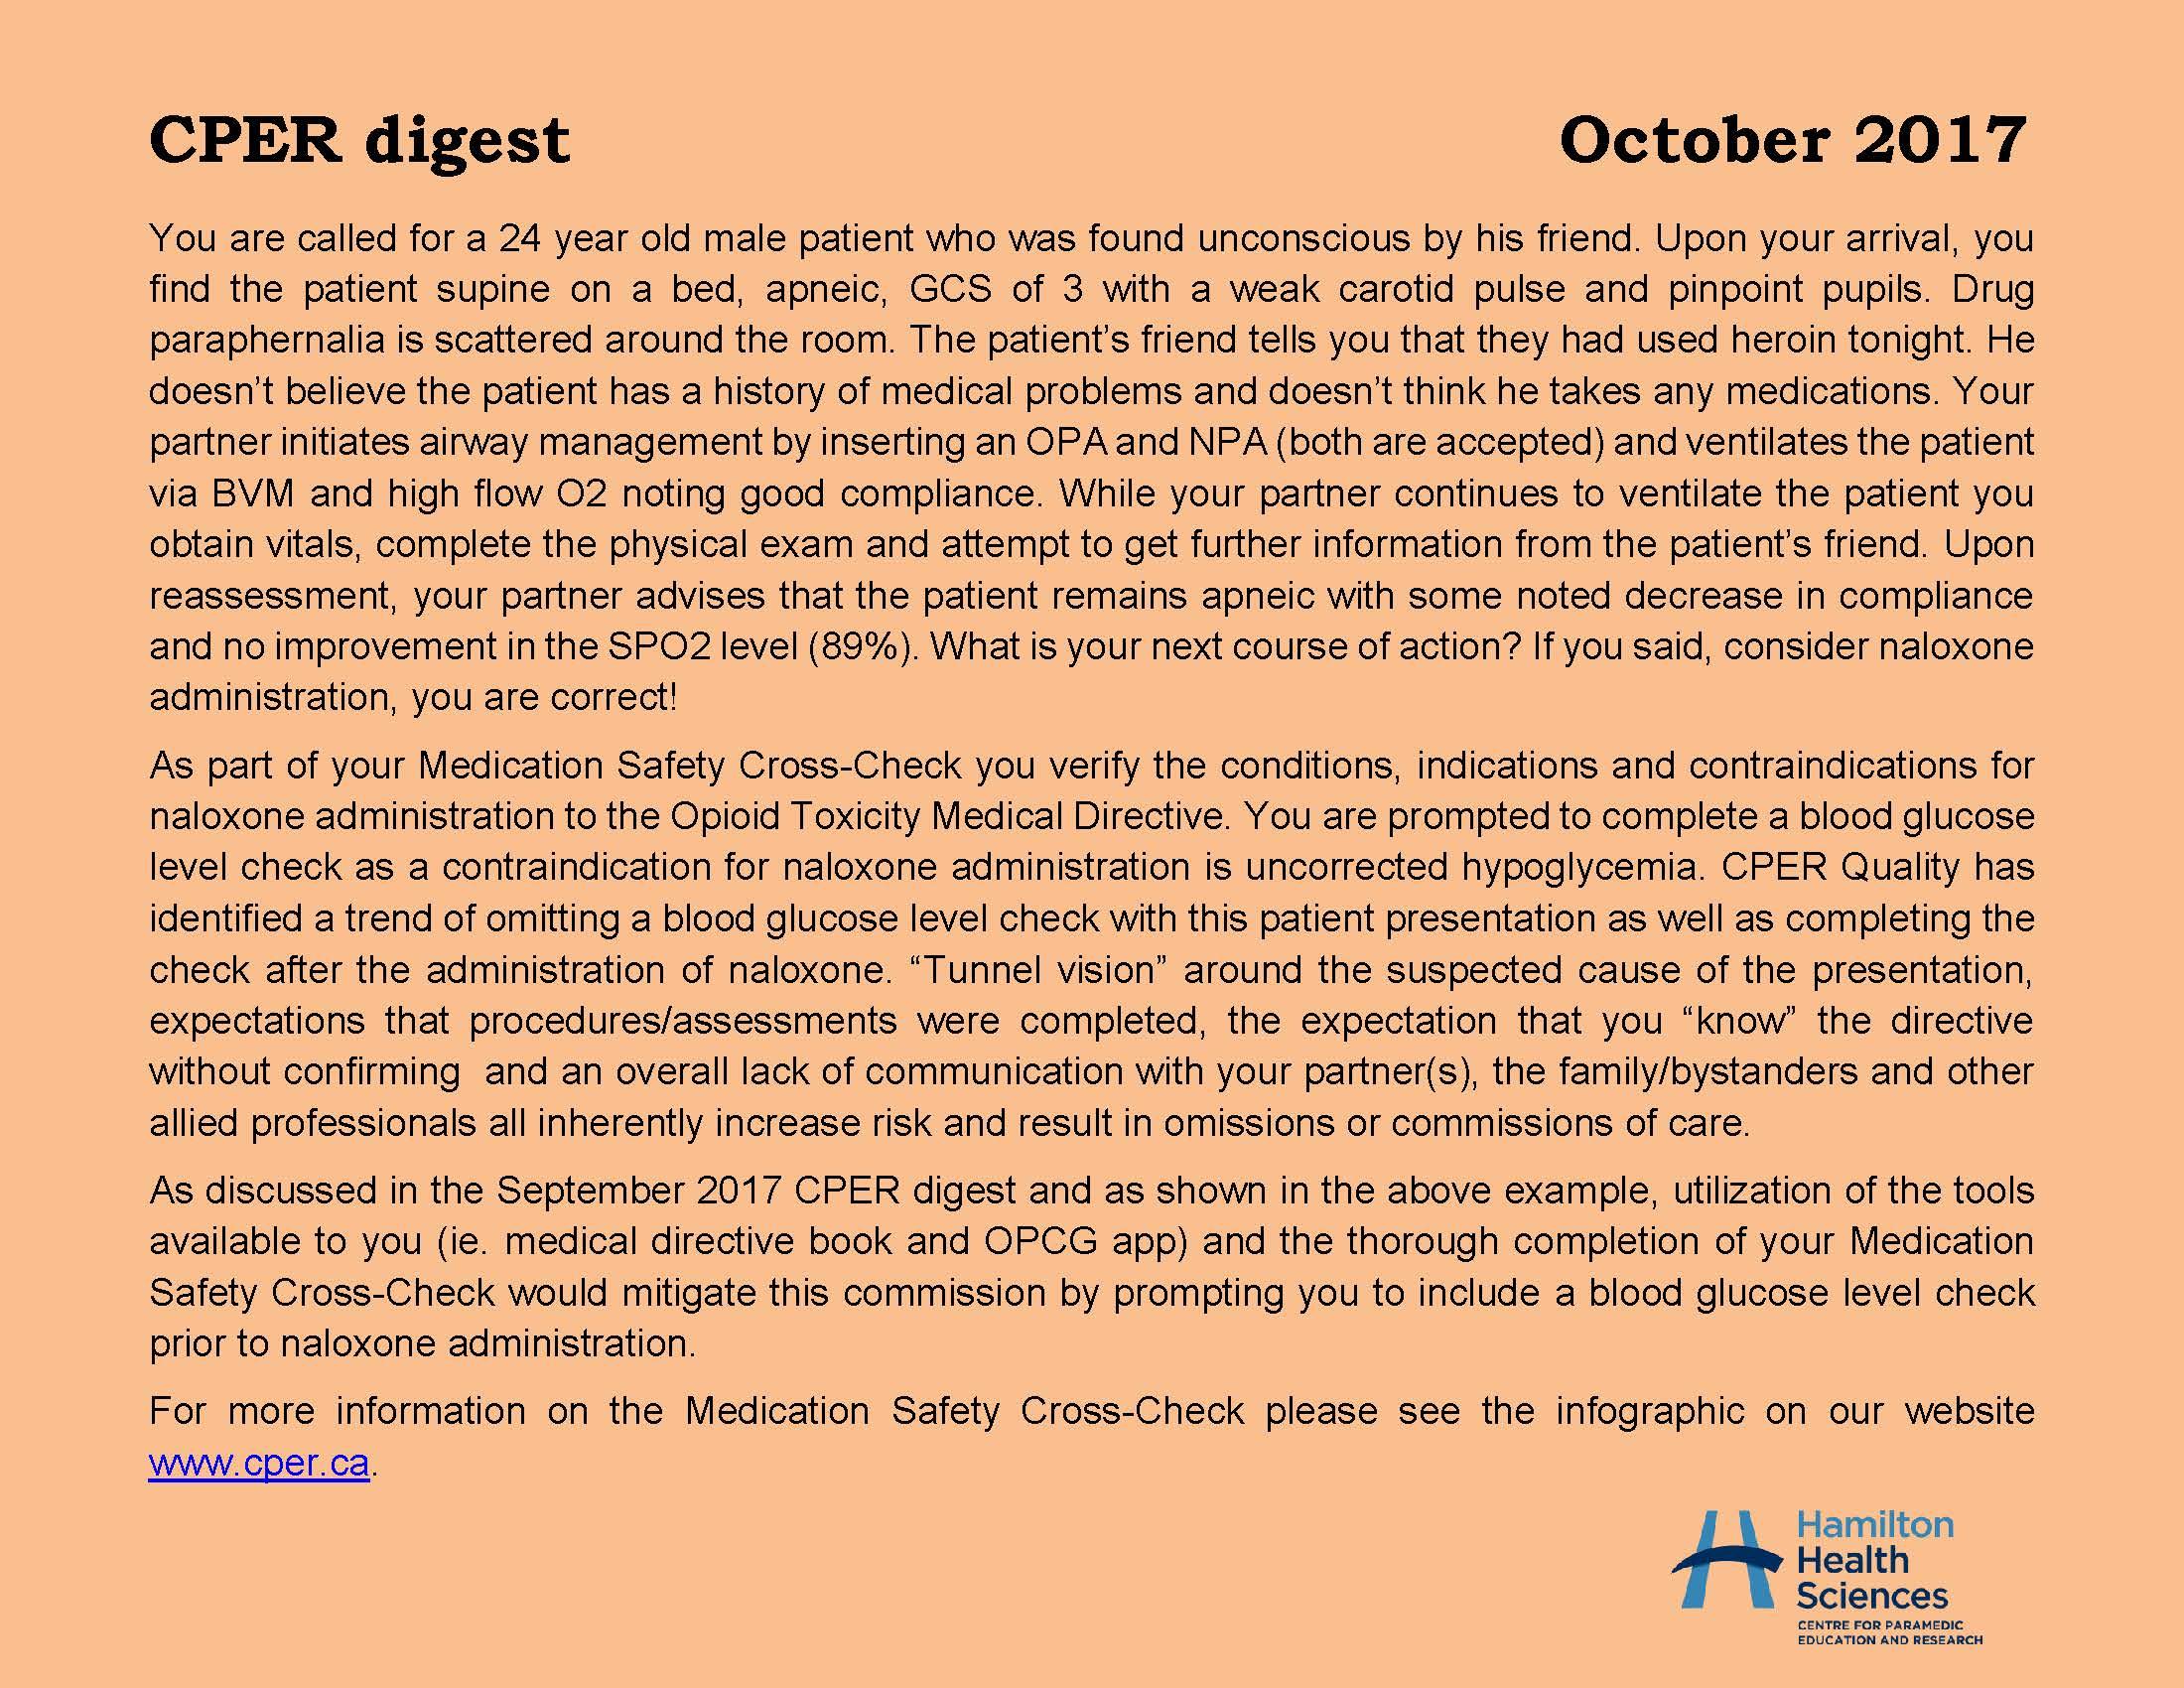 CPER digest October 2017